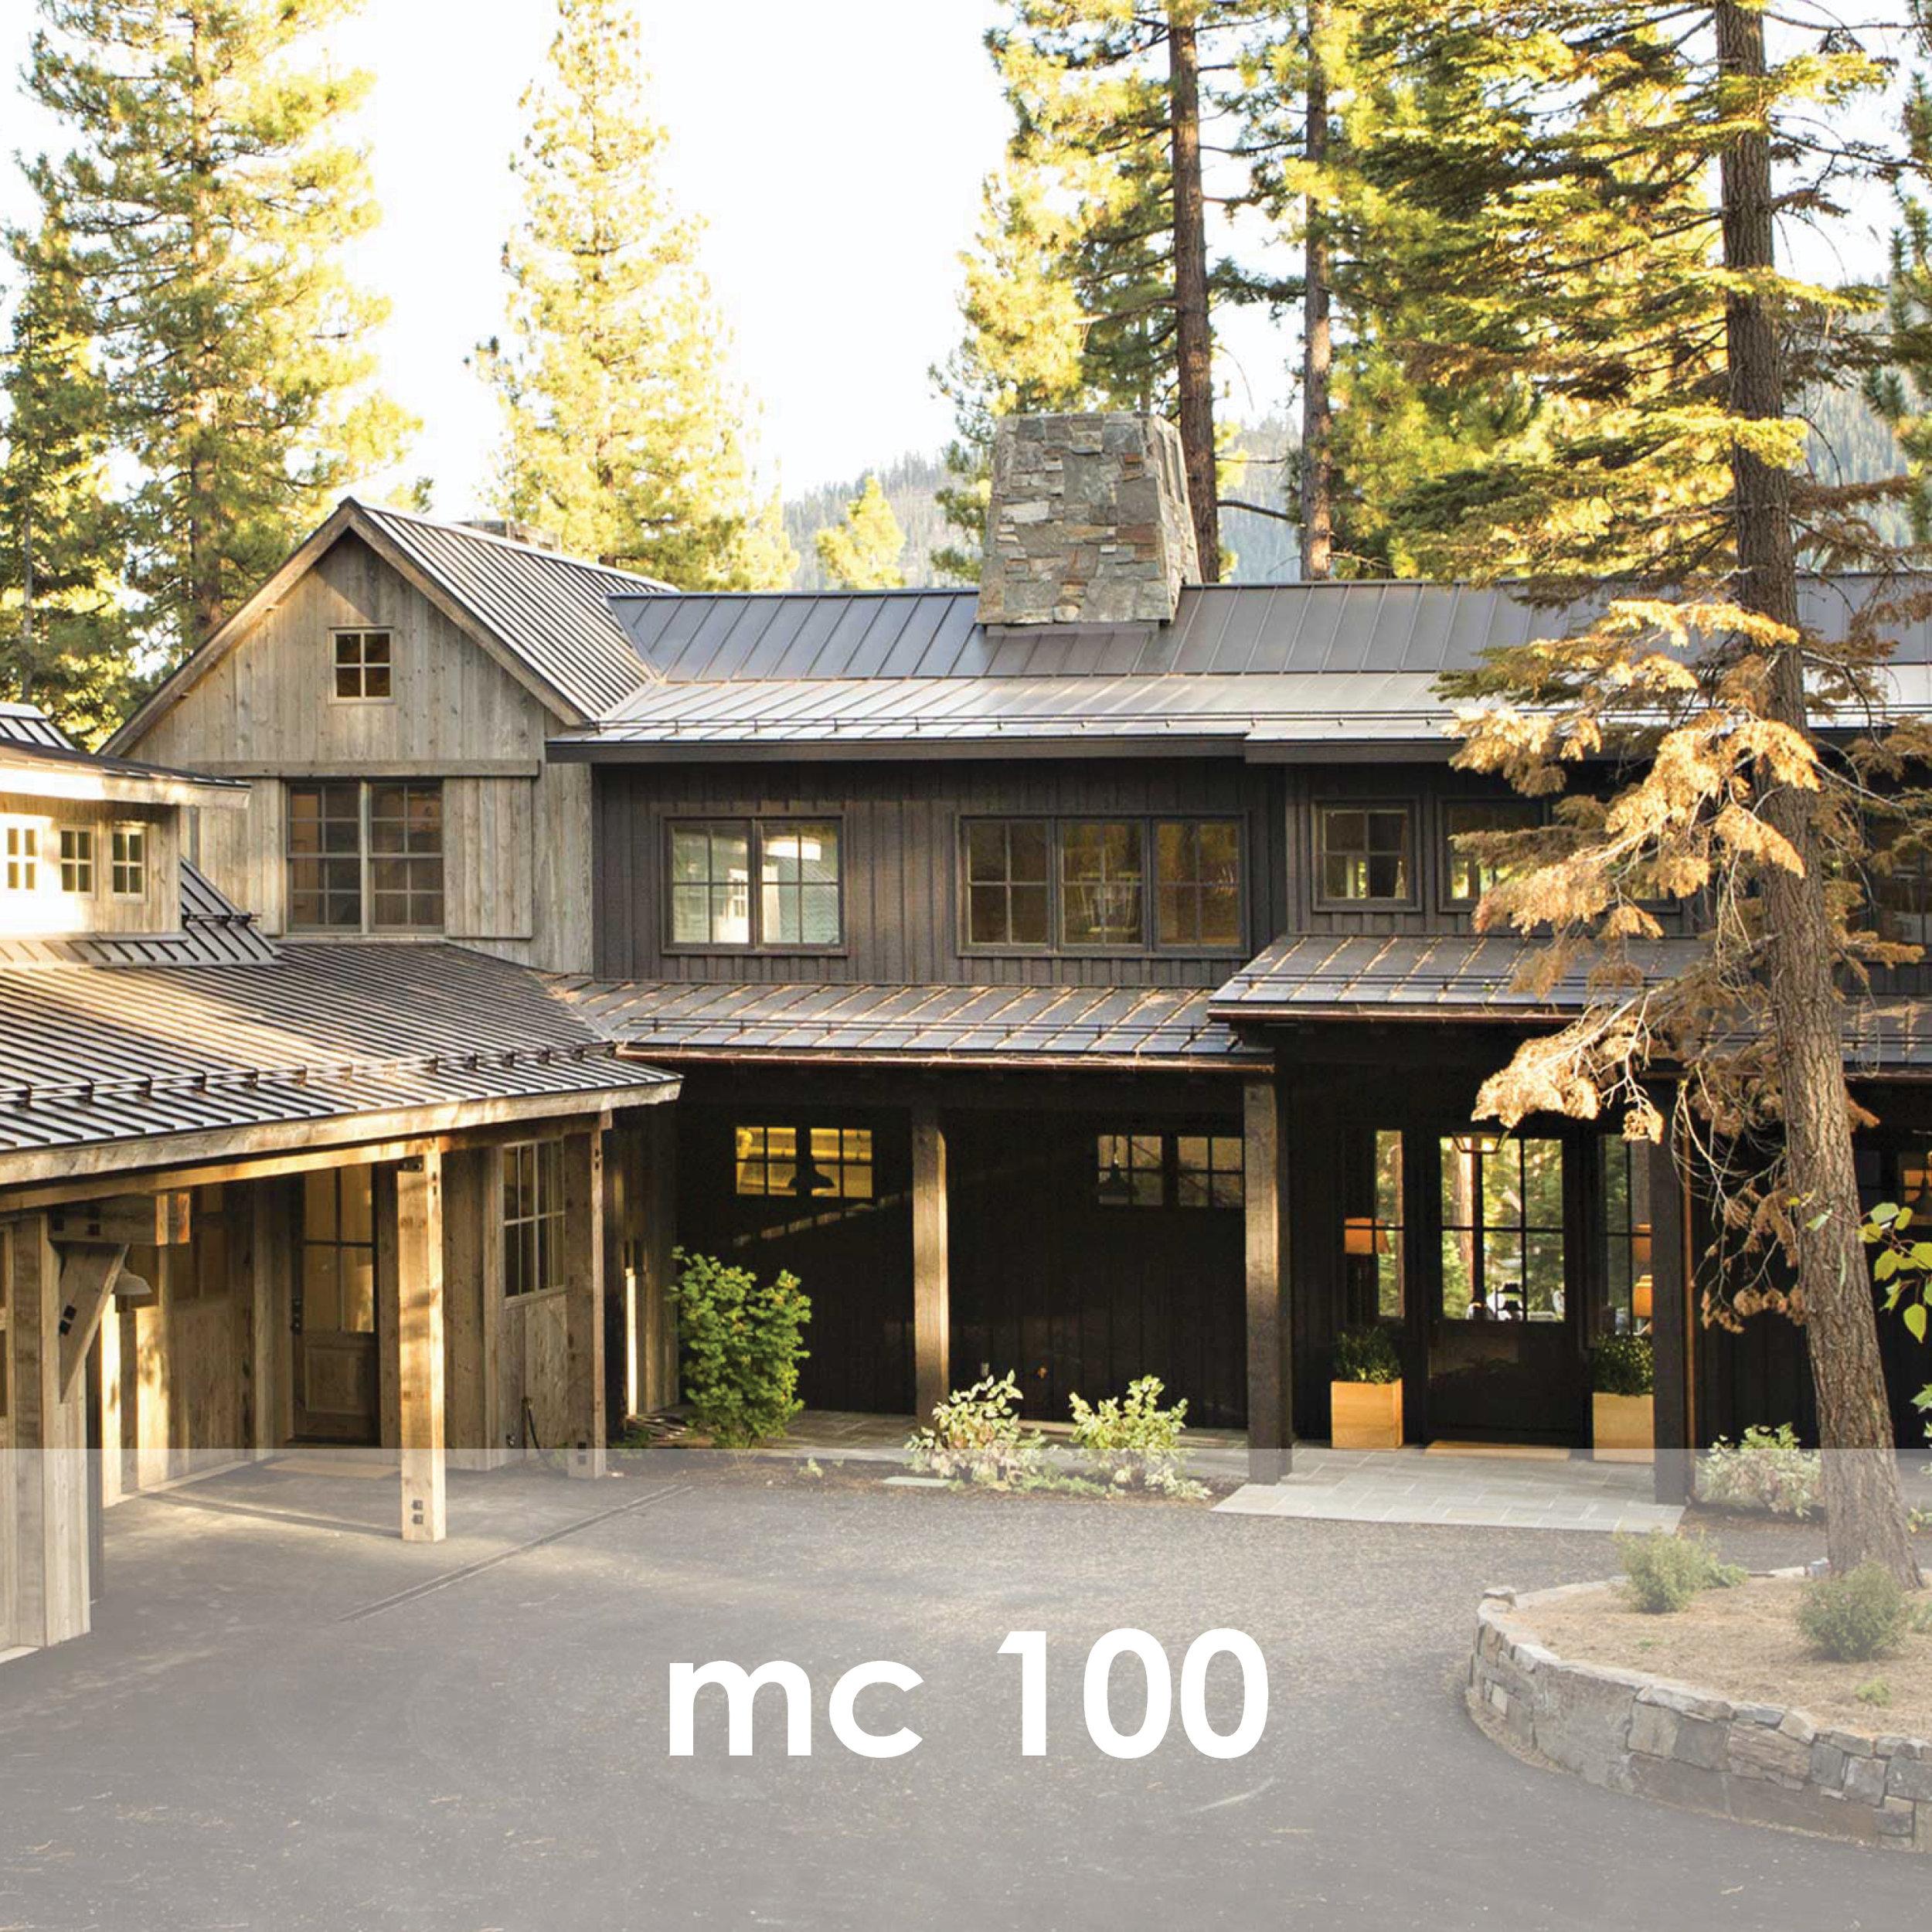 mc-100.jpg